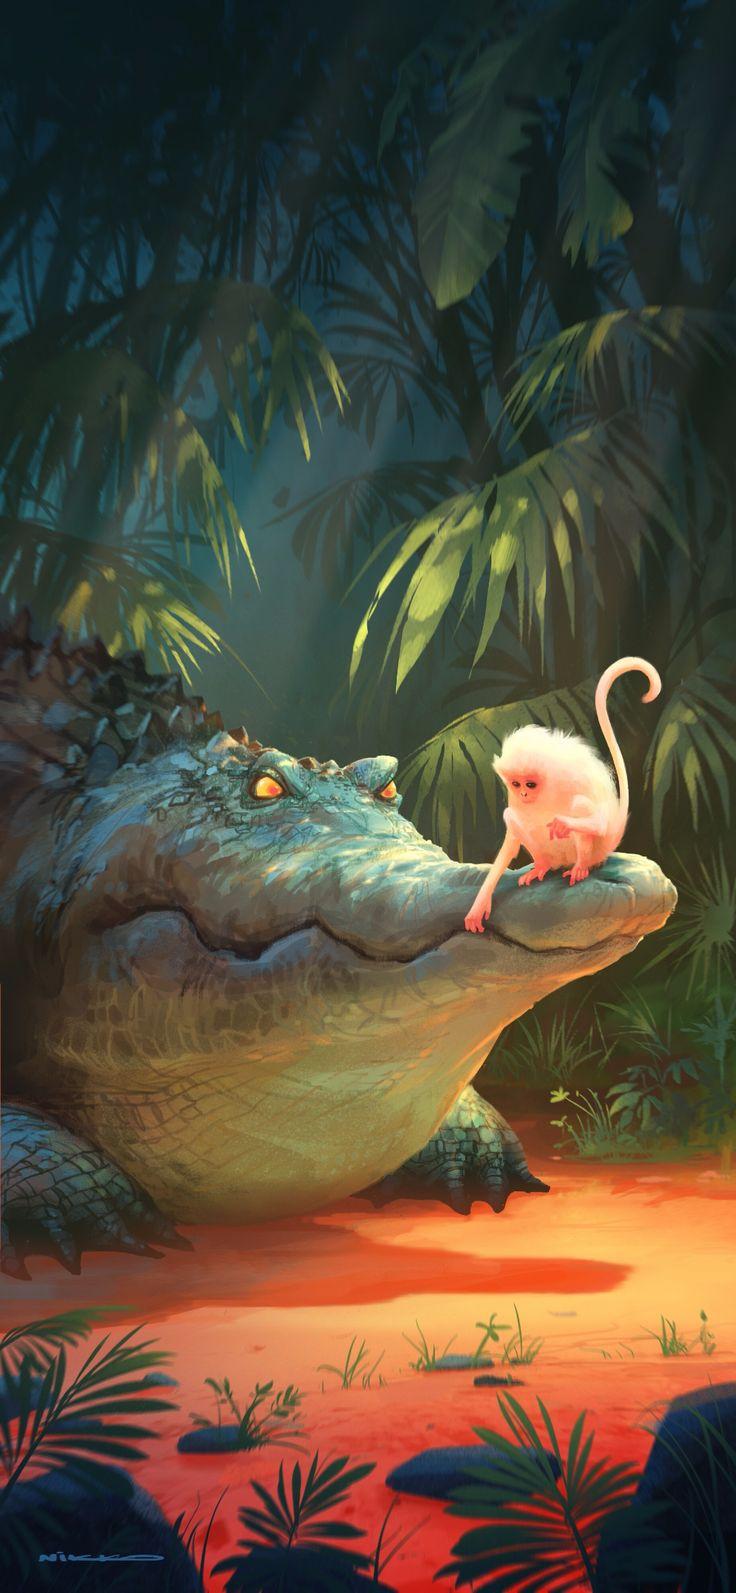 ArtStation Monkey n Croc, Nikolai Lockertsen (With images)